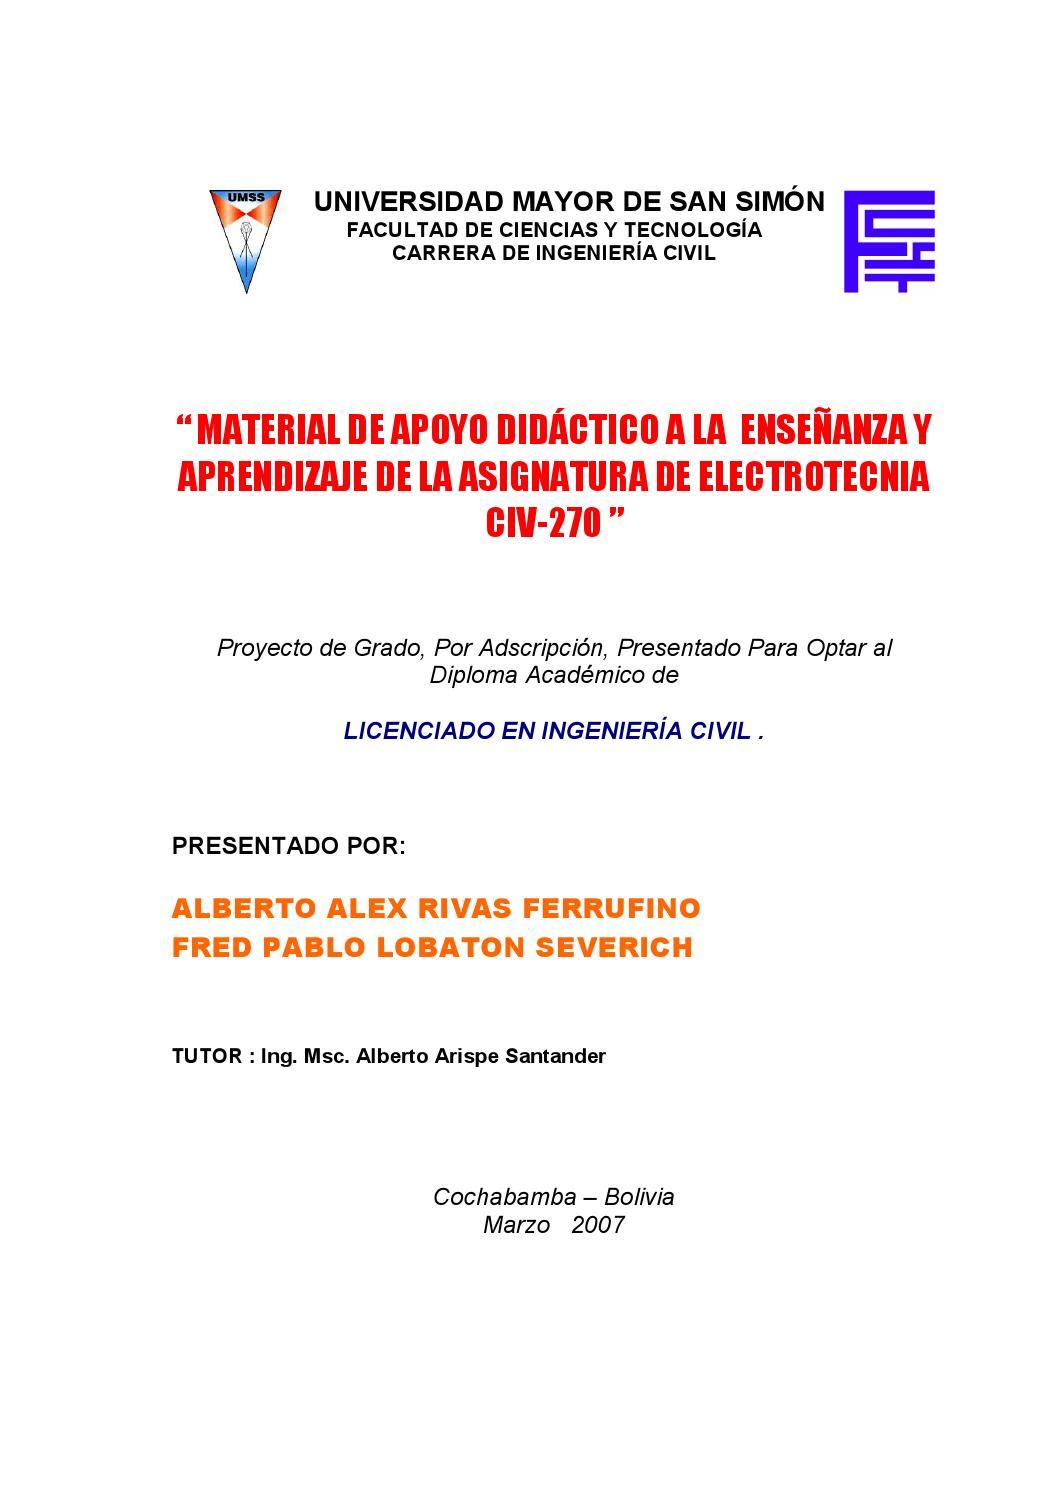 001electrotecnia by CESAR ROSADO - issuu